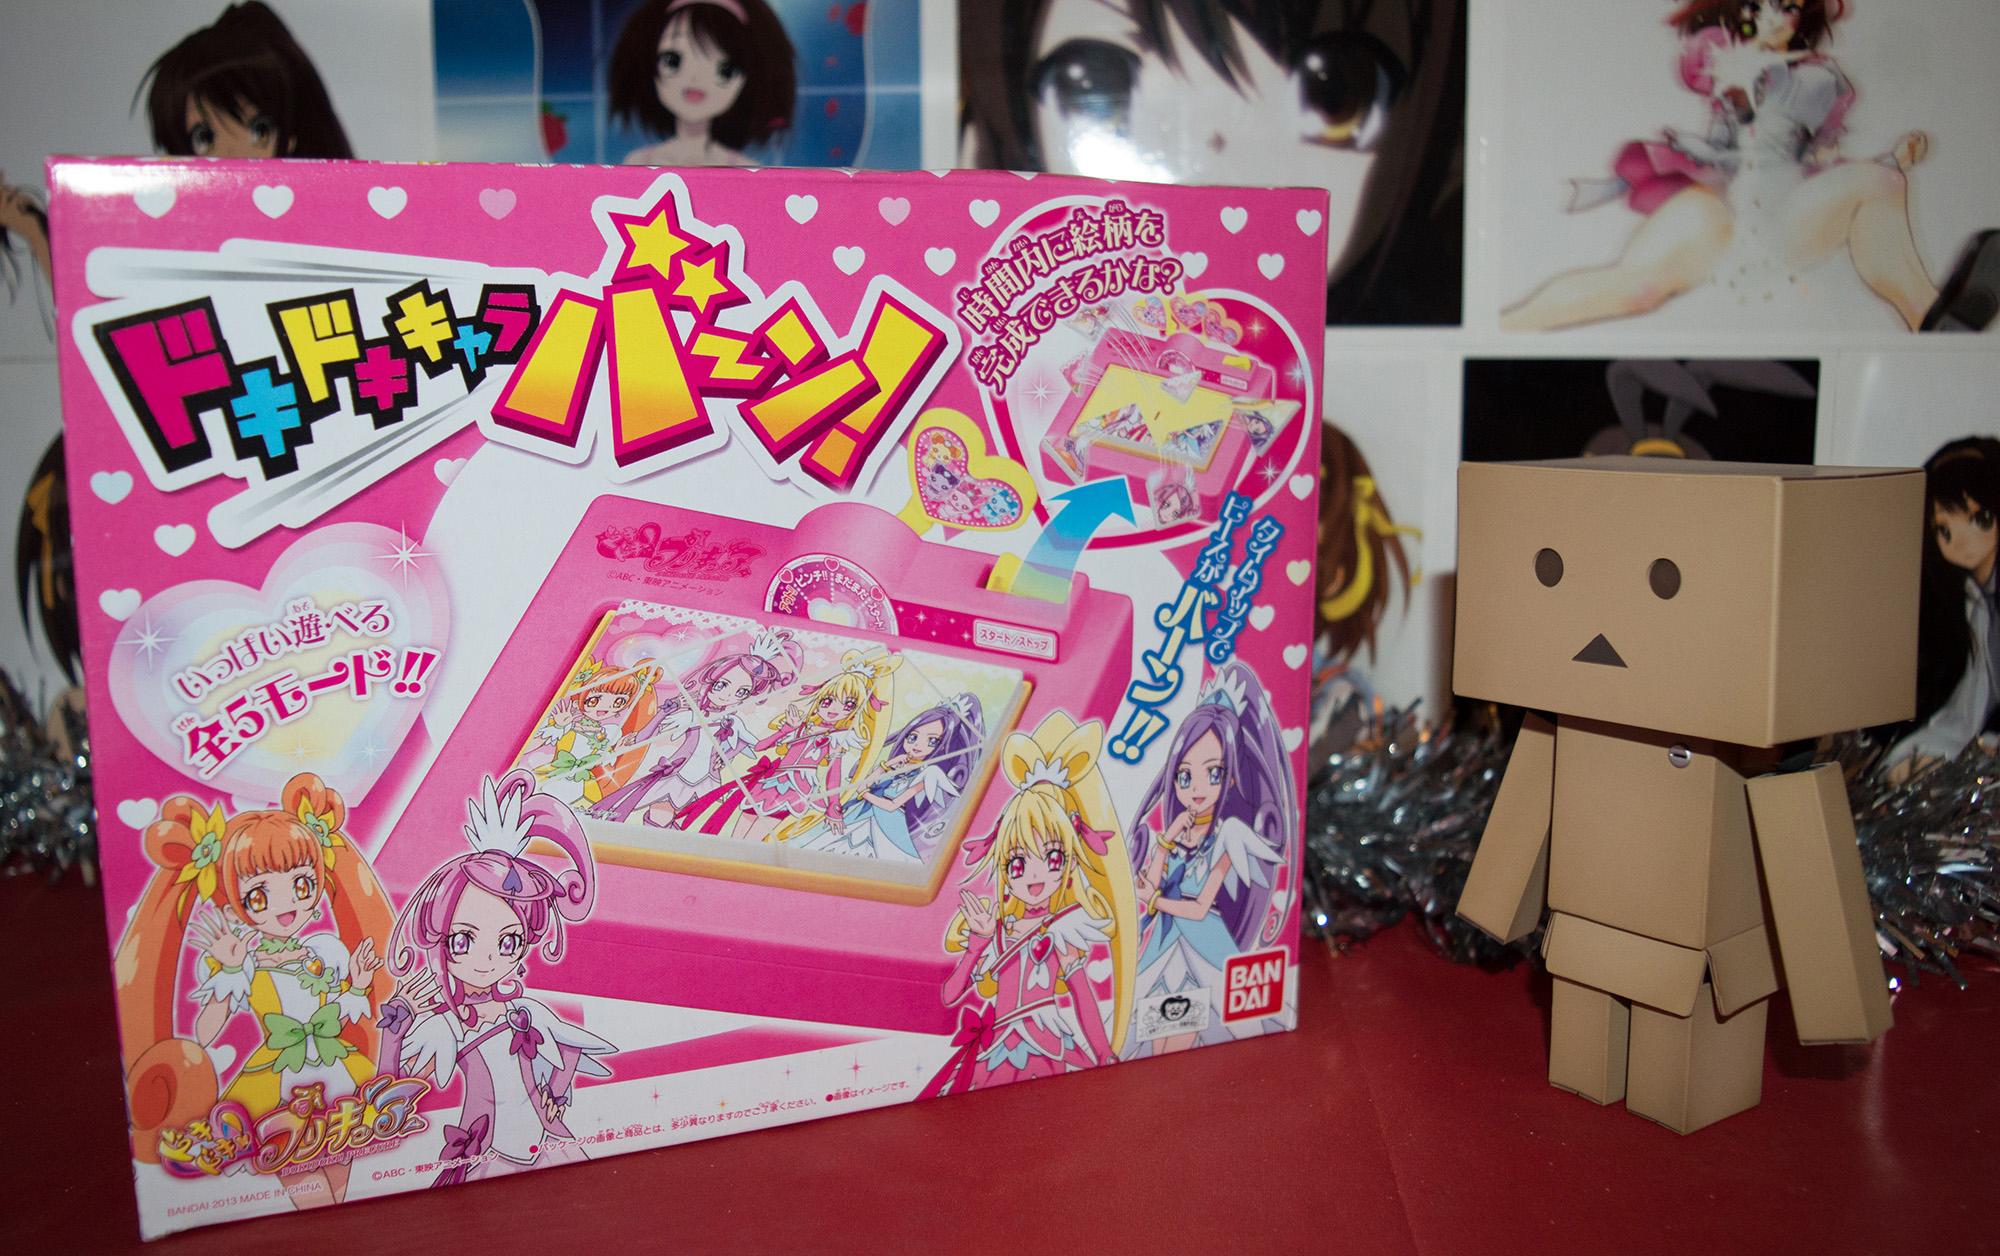 JList Fuku-Bukuro Lucky Anime Toy Set Overview haruhichan.com Dokidoki! Precure - Toy Puzzle